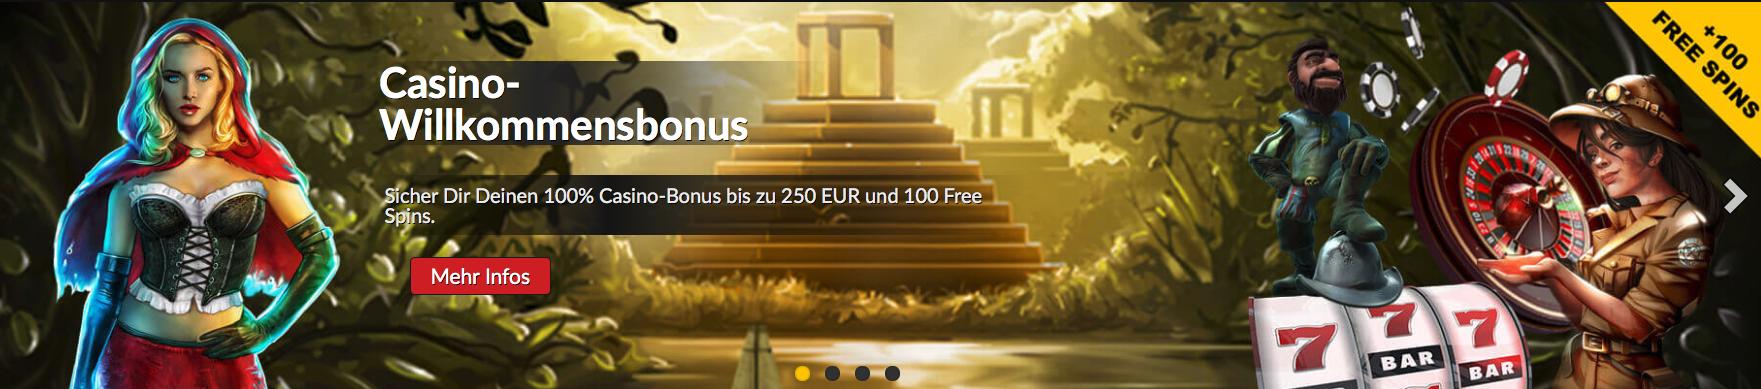 willkommensbonus-casino-bonkersbet